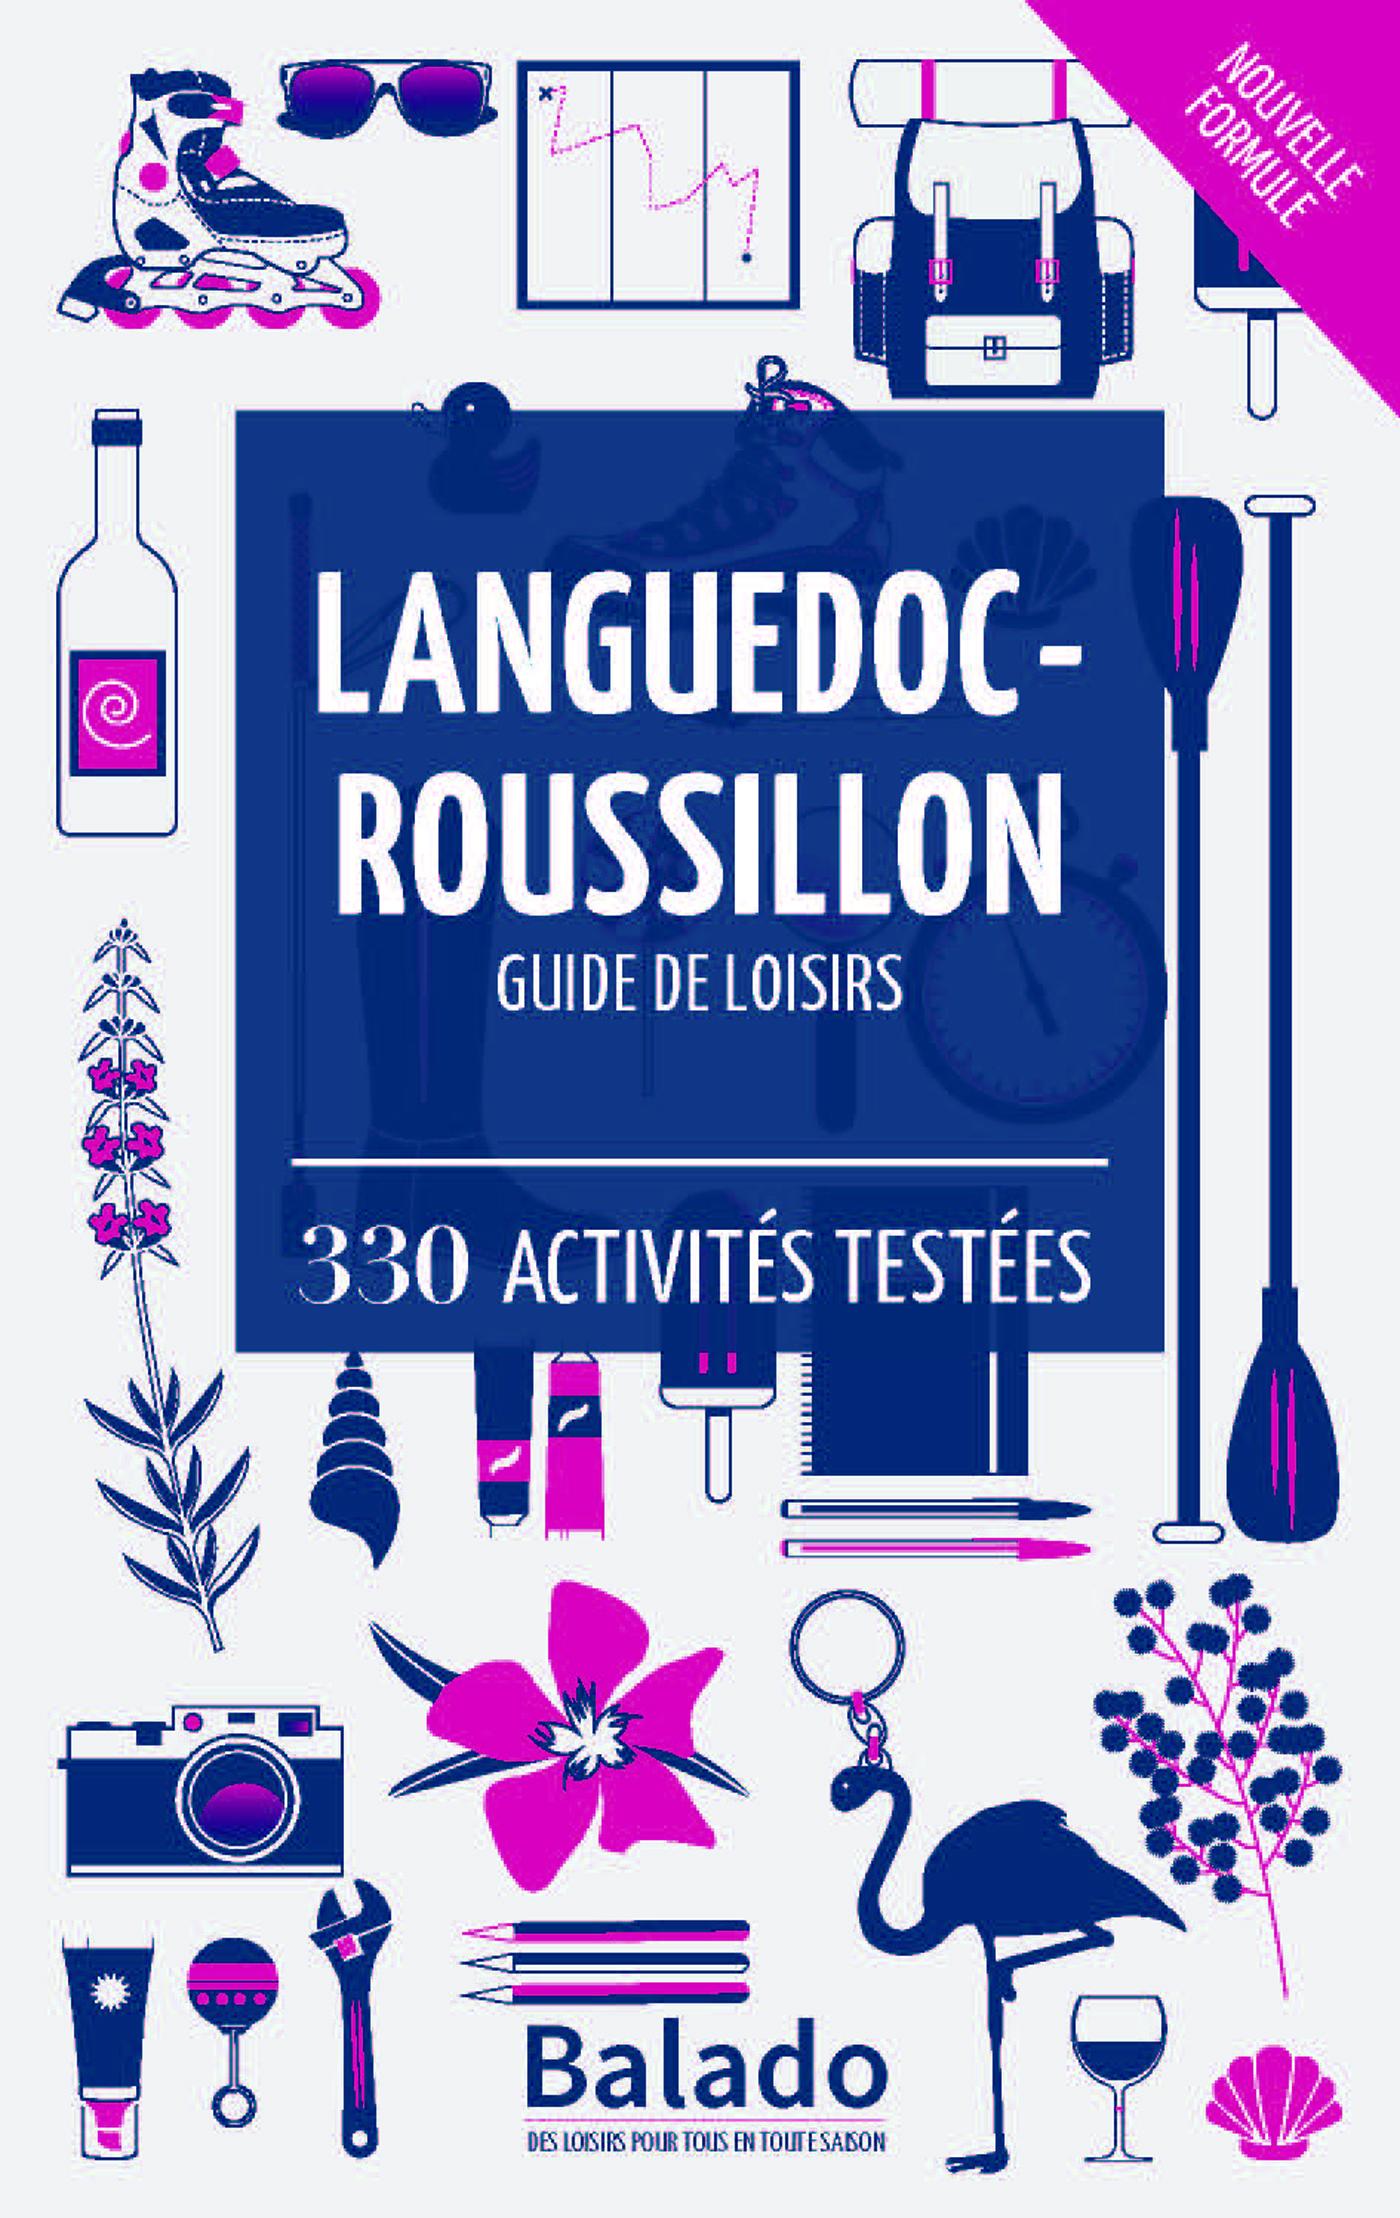 BALADO LANGUEDOC ROUSSILLON